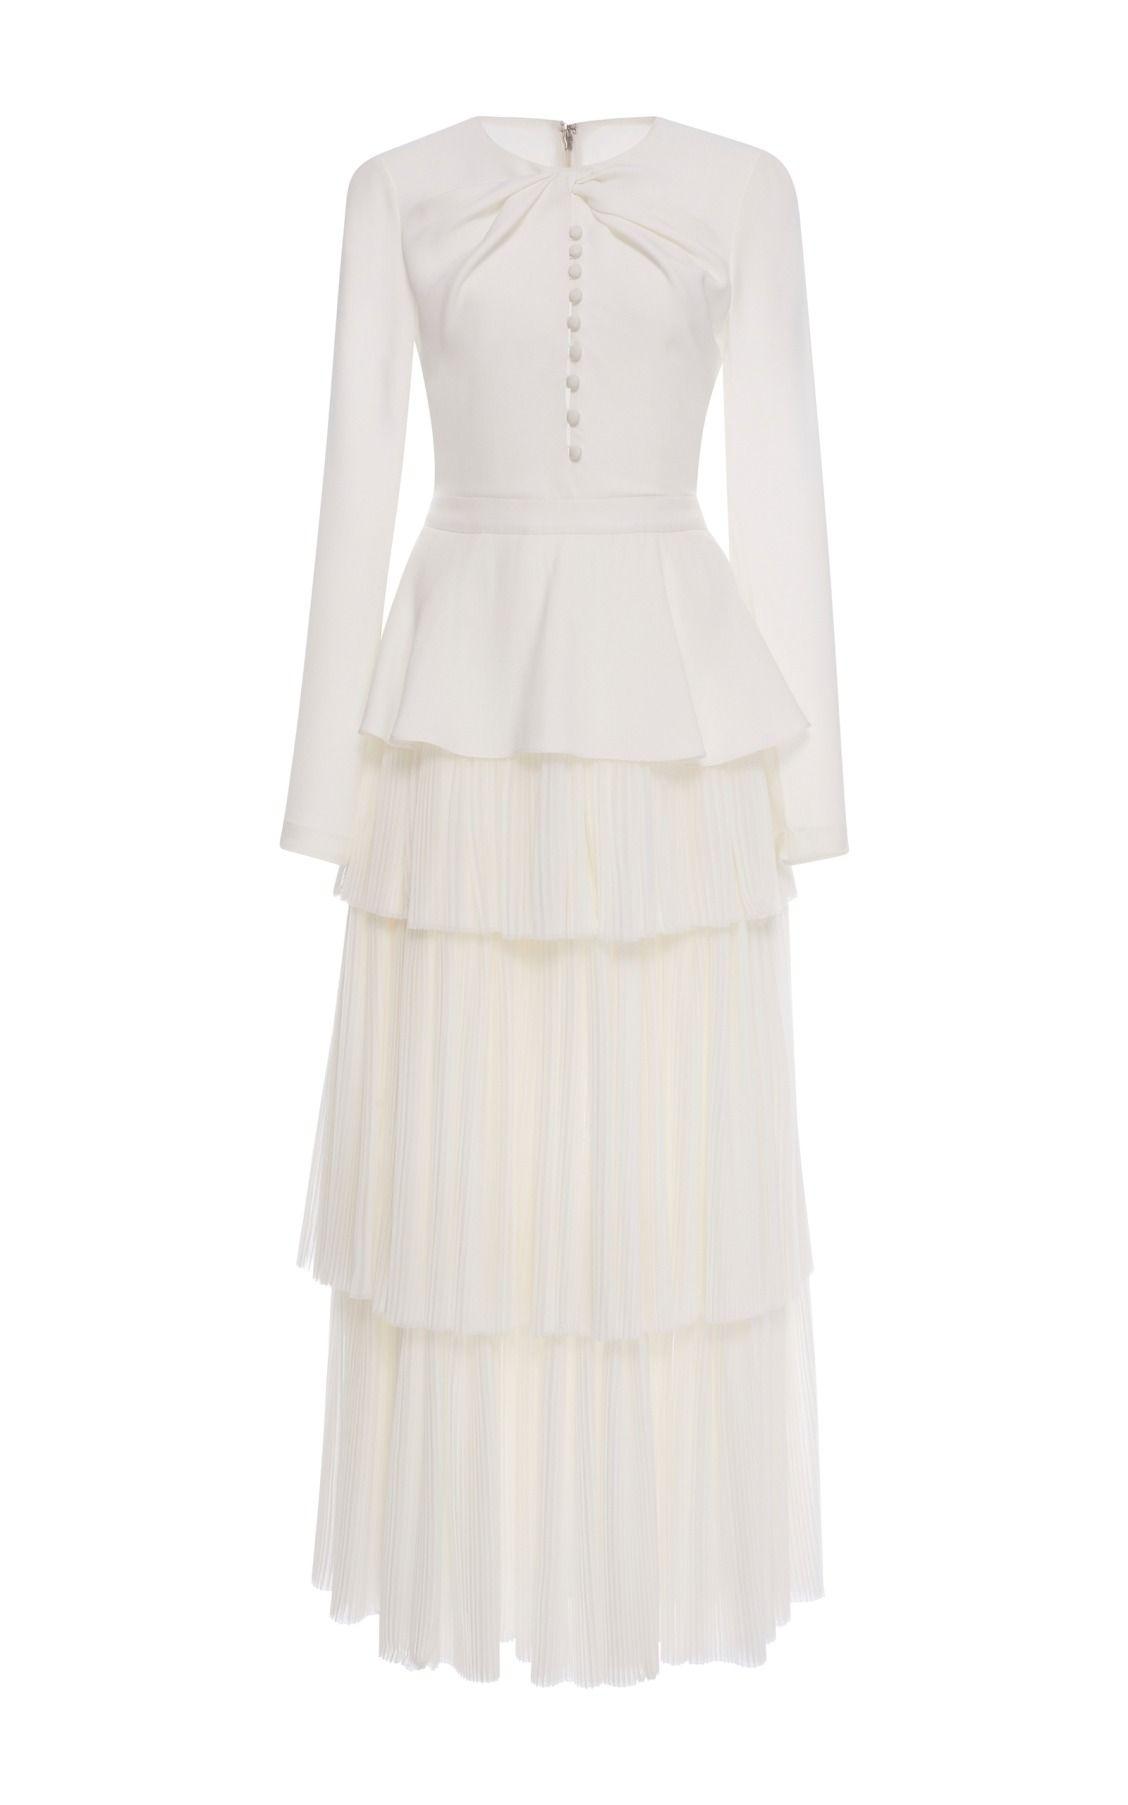 Long Sleeve Tiered Pleat Dress By Prabal Gurung Long Sleeve Silk Dress White Long Sleeve Dress Long Silk Skirt [ 1805 x 1128 Pixel ]